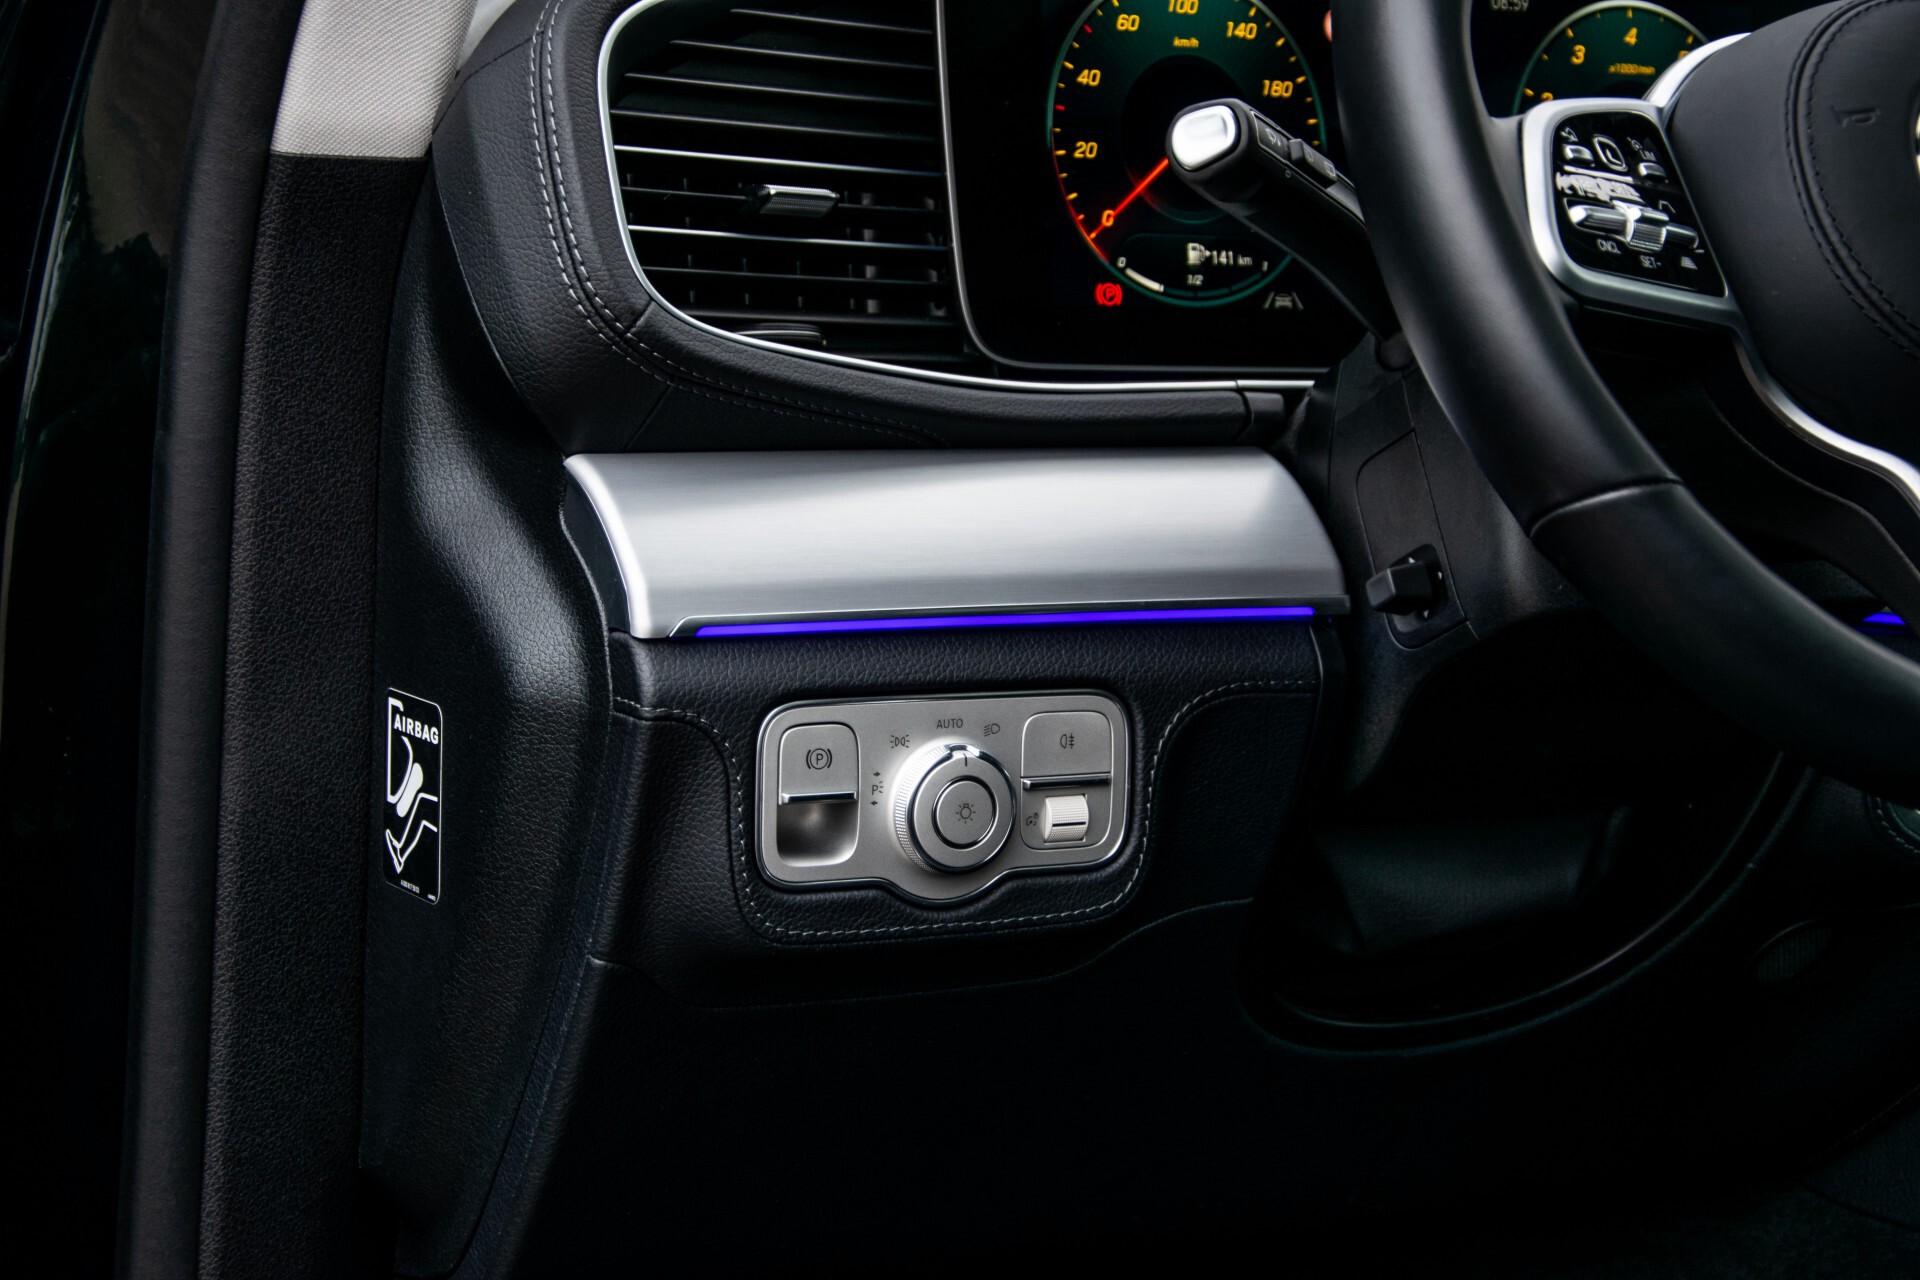 Mercedes-Benz GLE 450 4-M 7-Persoons AMG Massage/Rij-assist/Keyless/TV/360/Night/Trekhaak Aut9 Foto 23